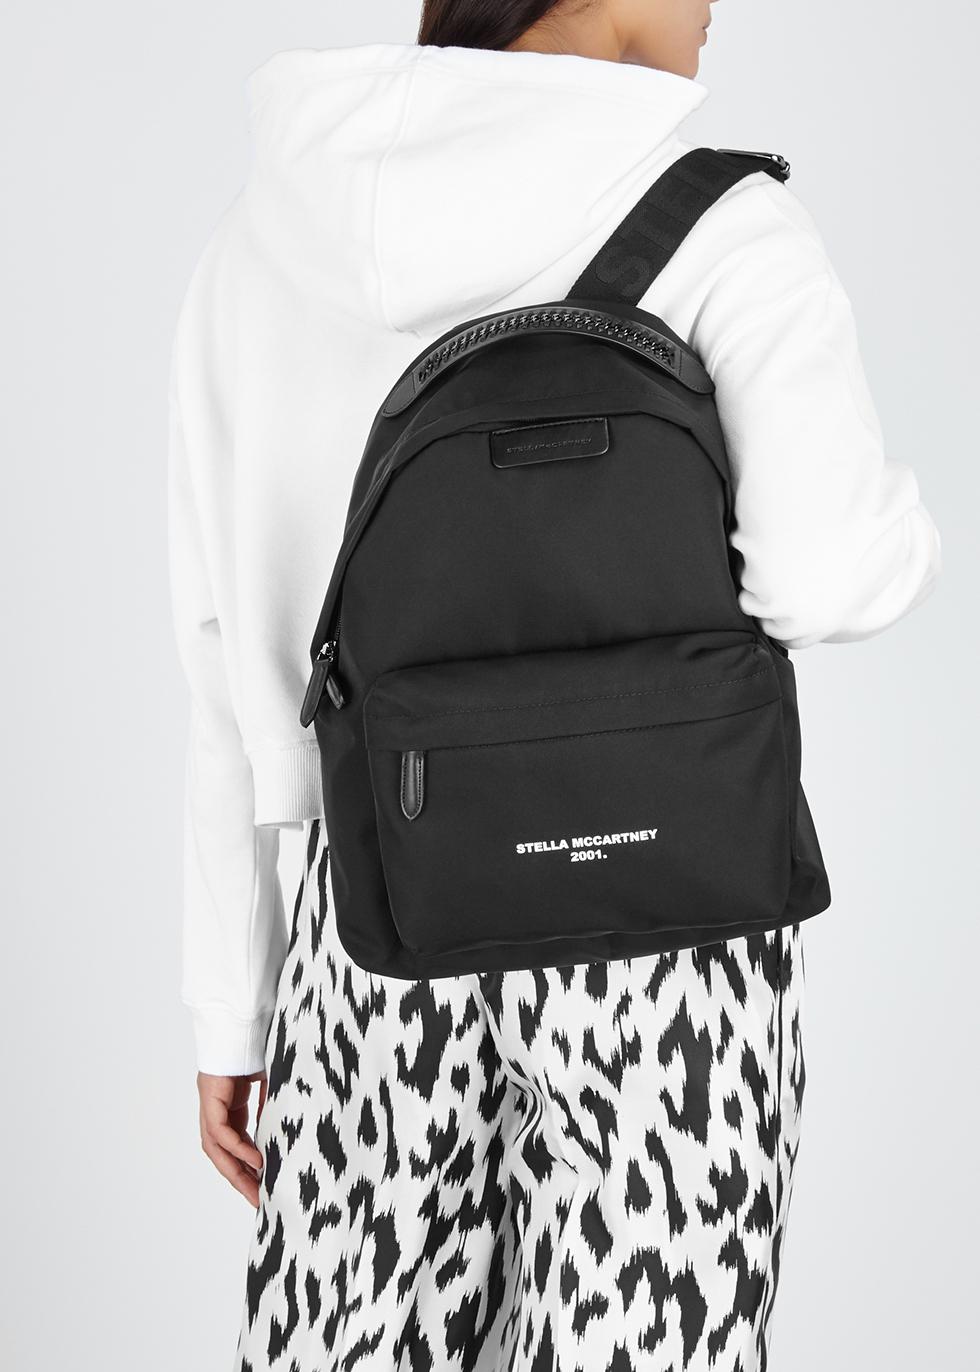 51820a6610c3 Women's Designer Backpacks and Rucksacks - Harvey Nichols